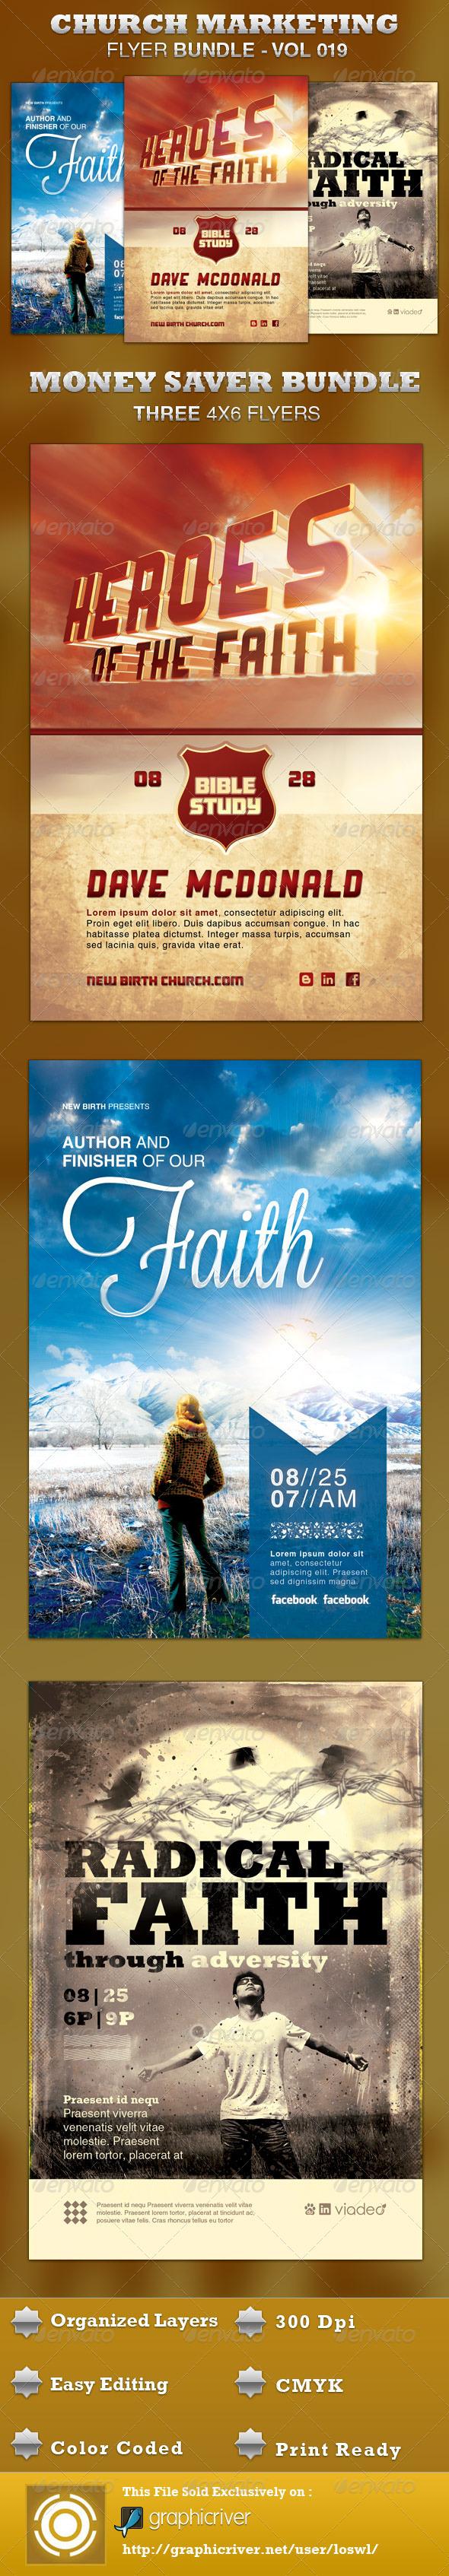 GraphicRiver Church Marketing Flyer Bundle-Vol 019 3548457